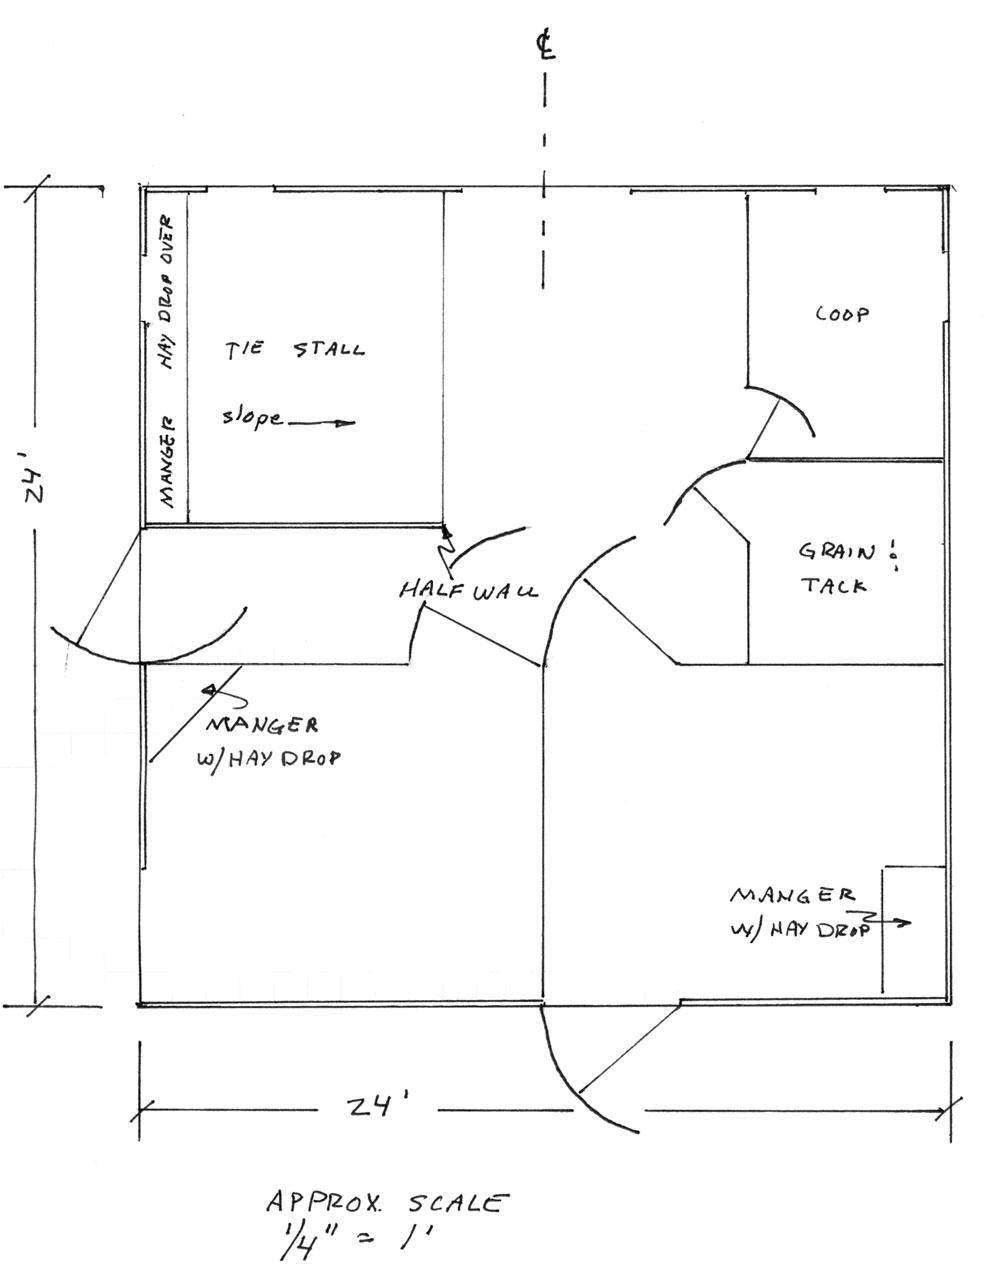 wrg 2833 horse barn wiring diagram. Black Bedroom Furniture Sets. Home Design Ideas